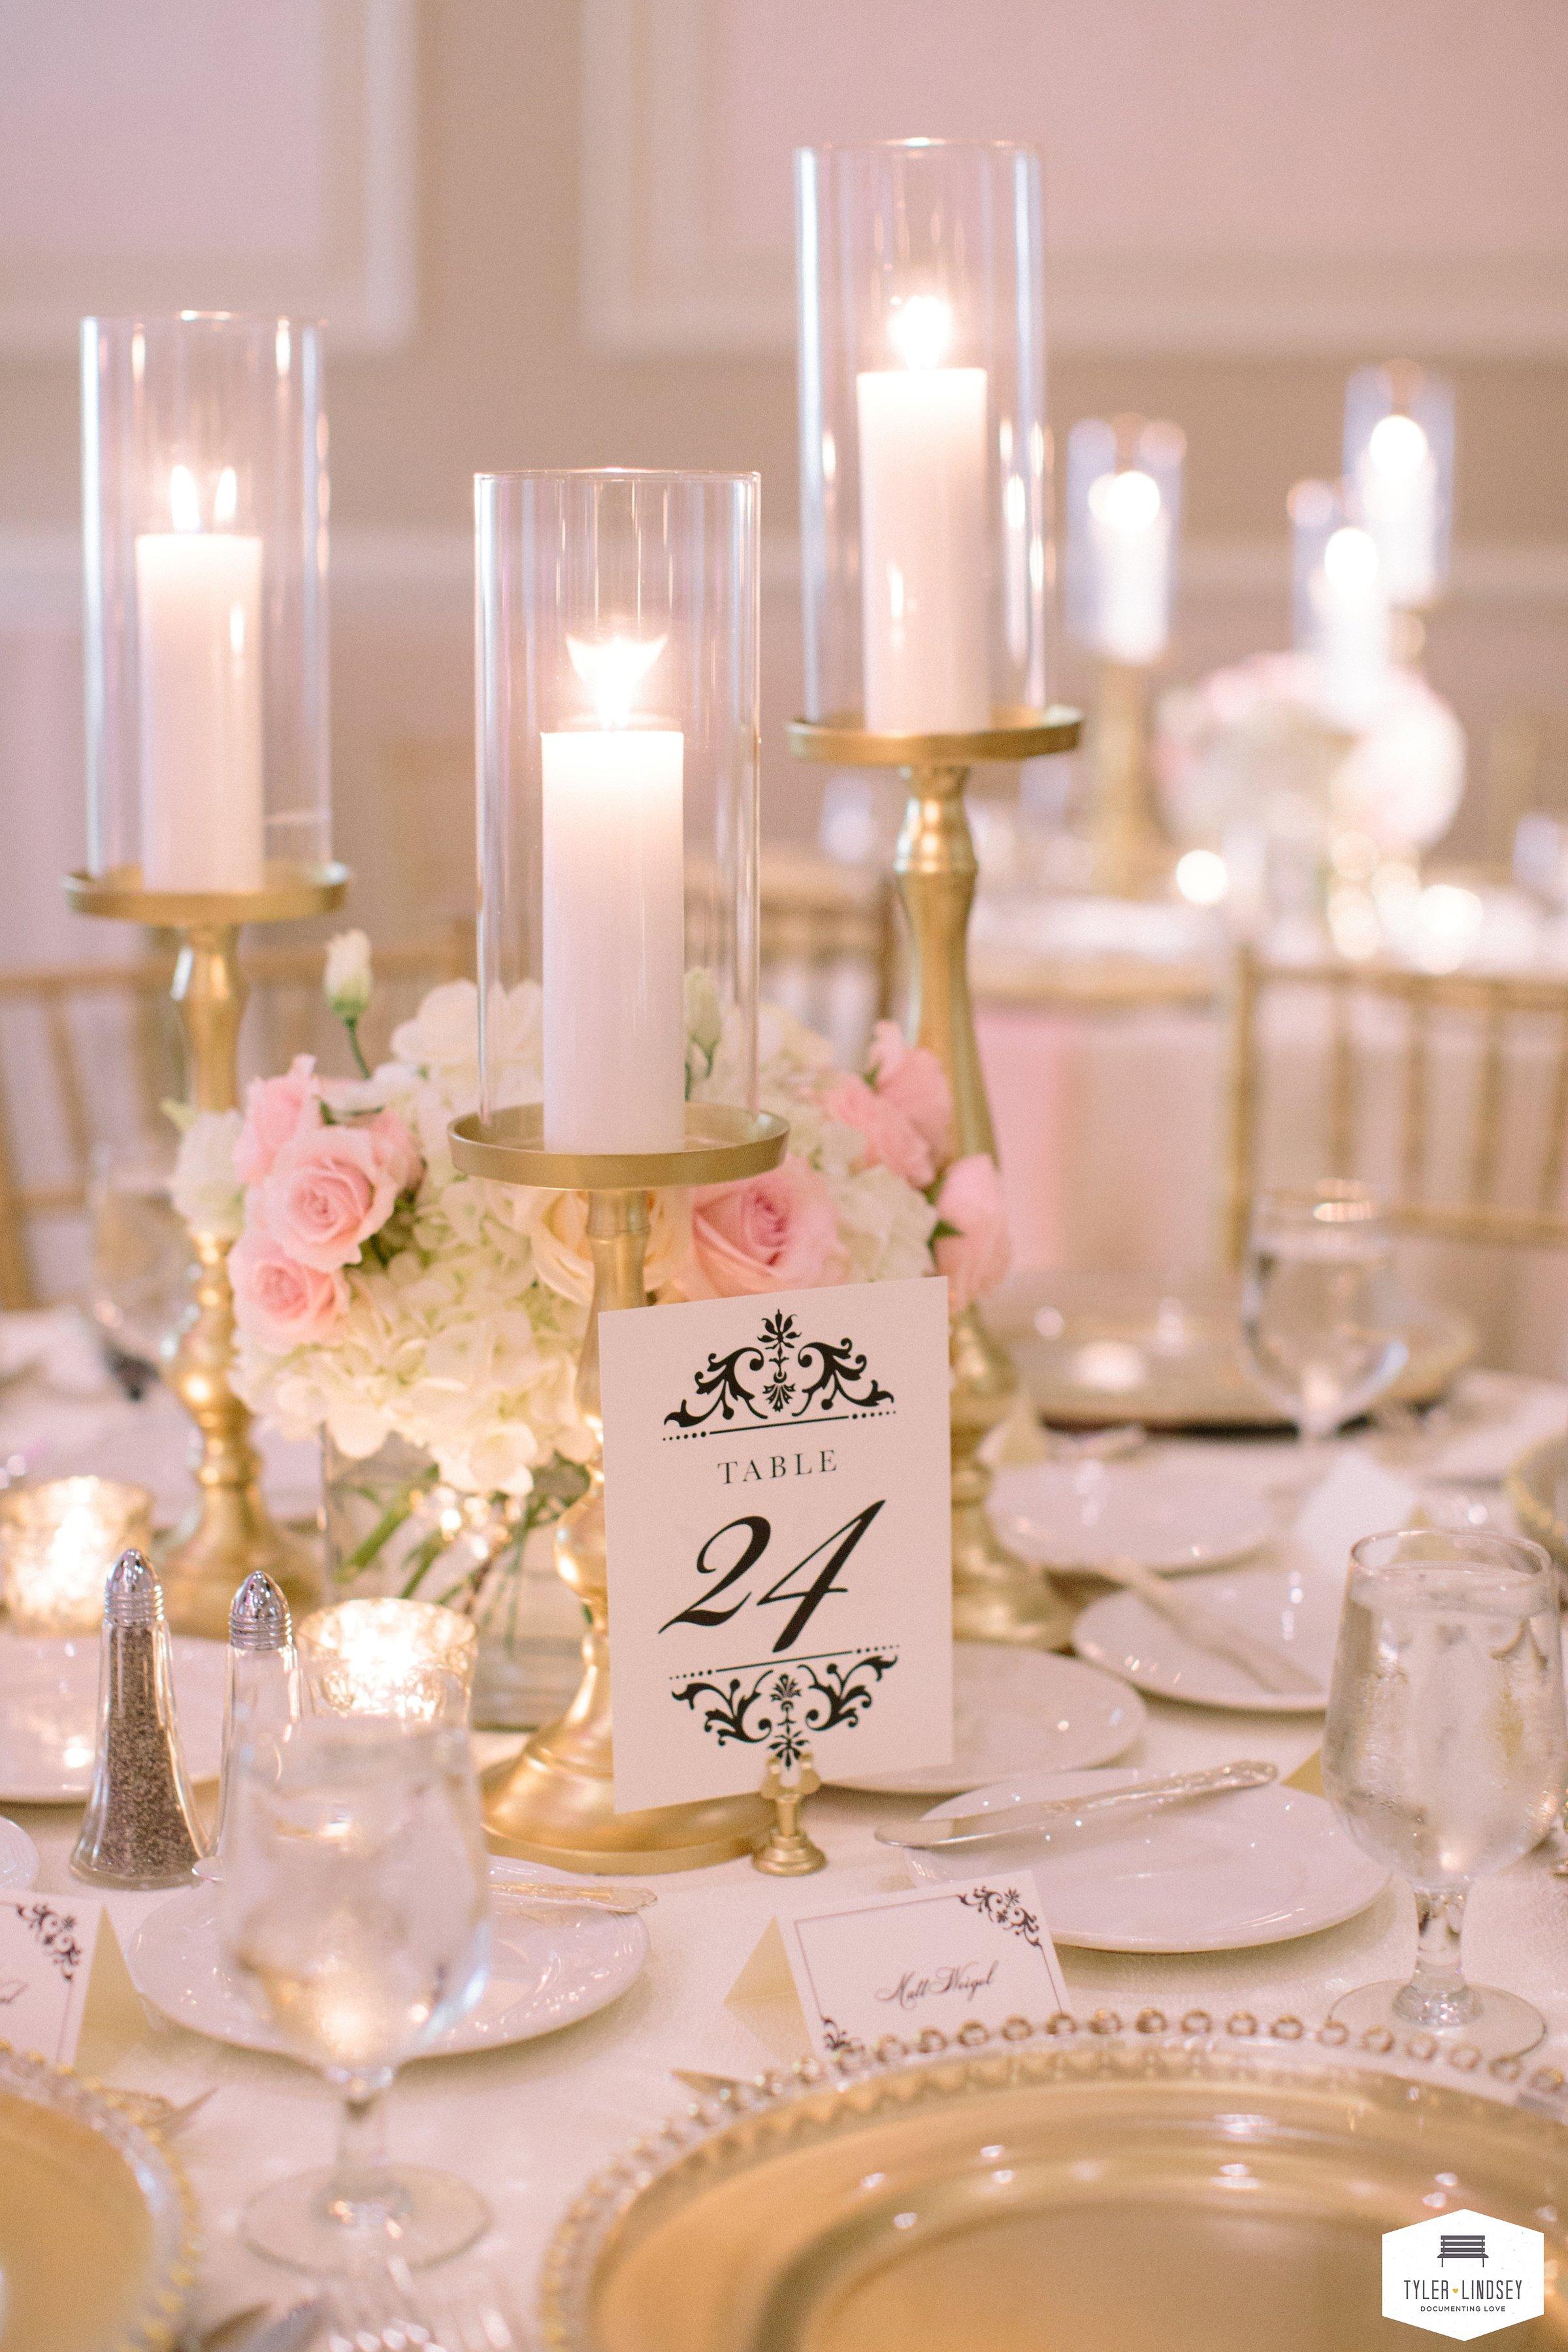 Elegant Blush, Pink and White Wedding - Prashe Decor